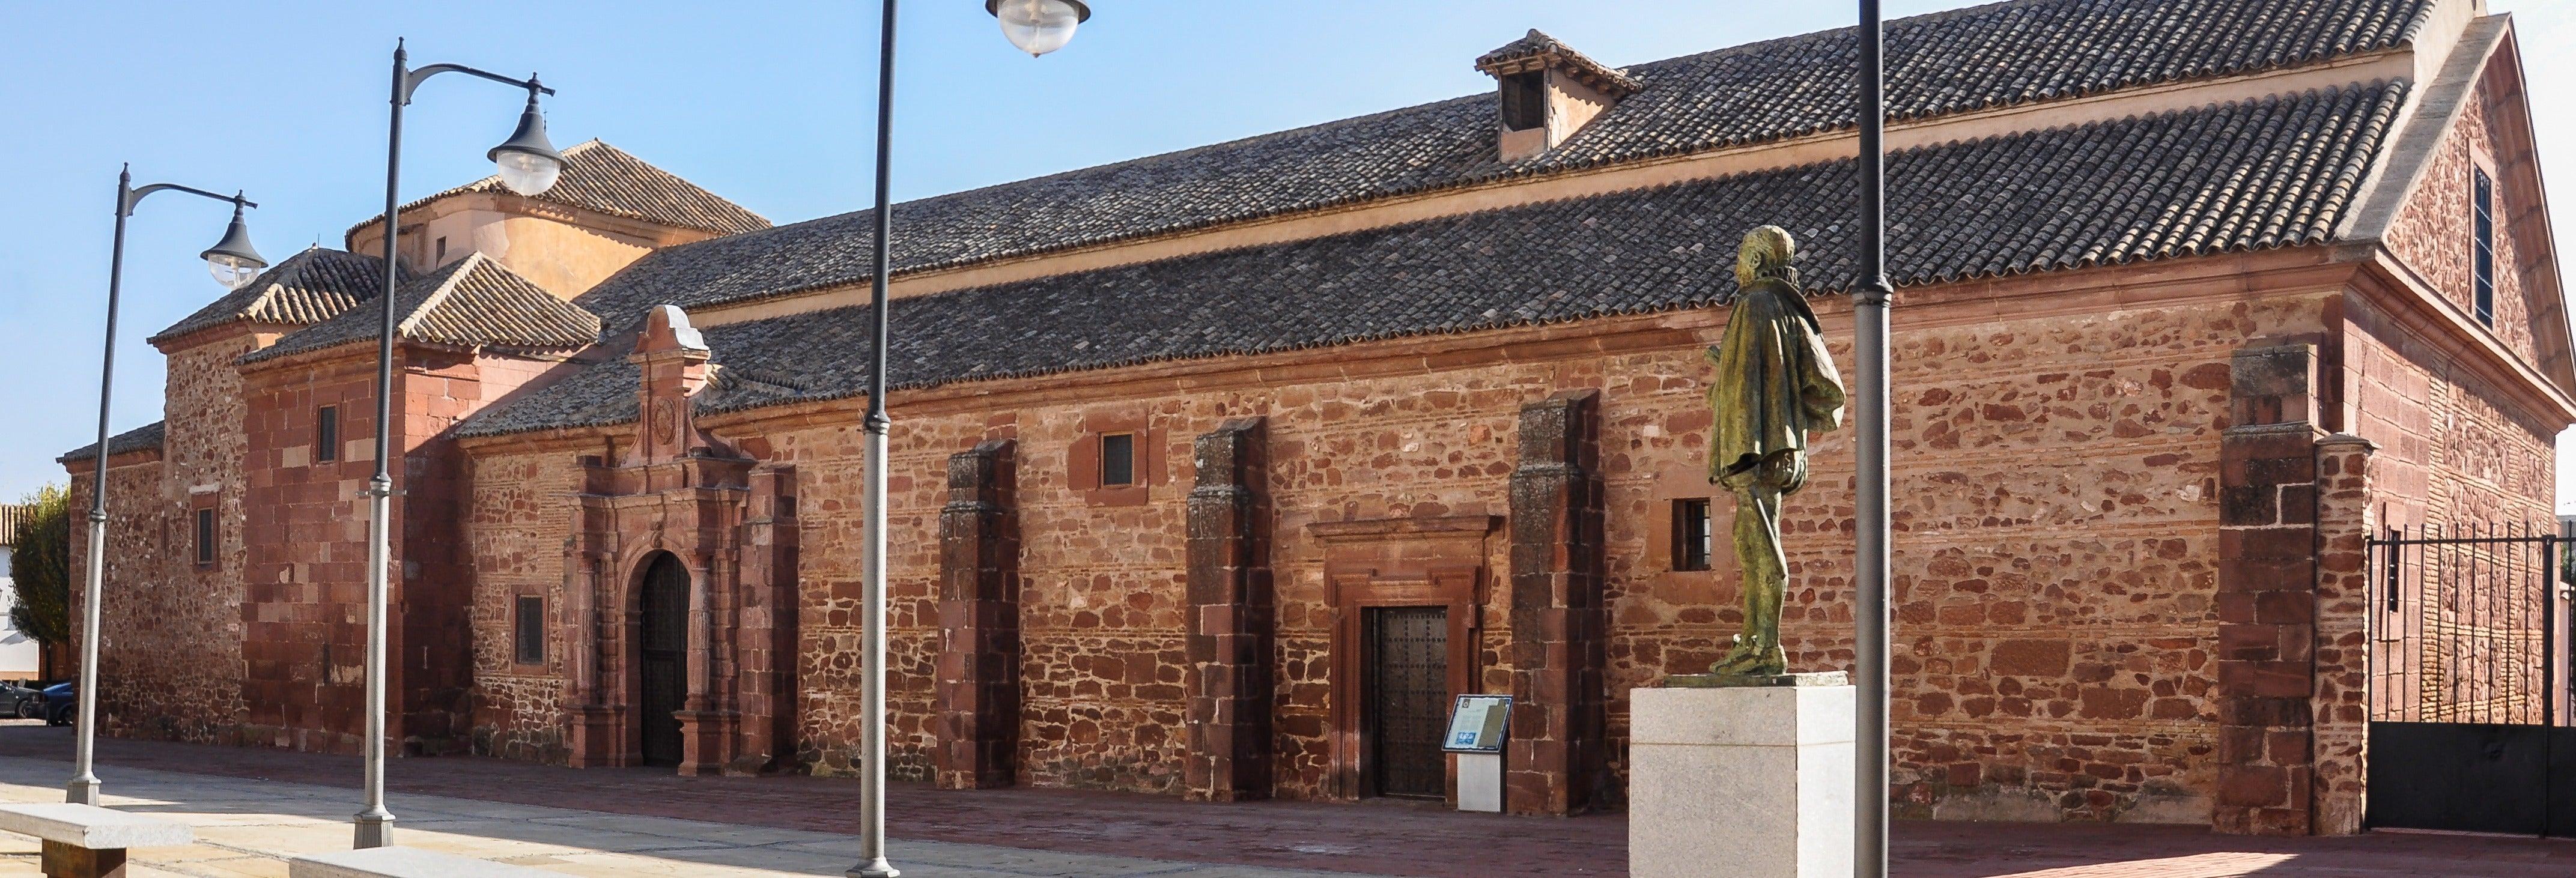 Tour of Alcazar de San Juan + El Hidalgo Museum